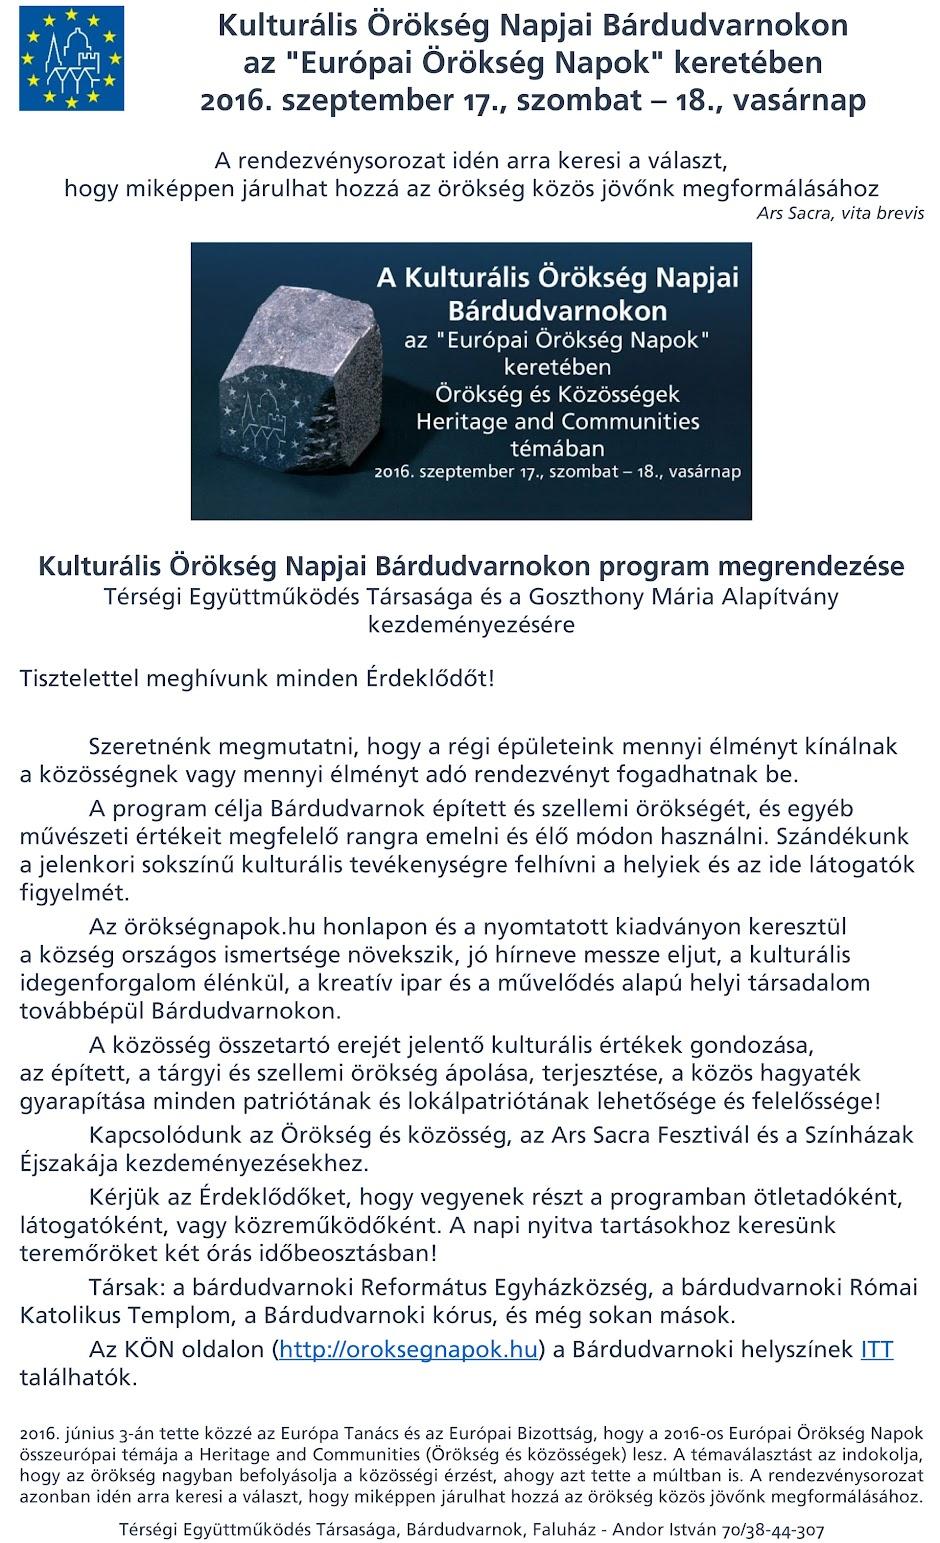 Kulturalis Örökség Napjai Bárdudvarnokon 2016